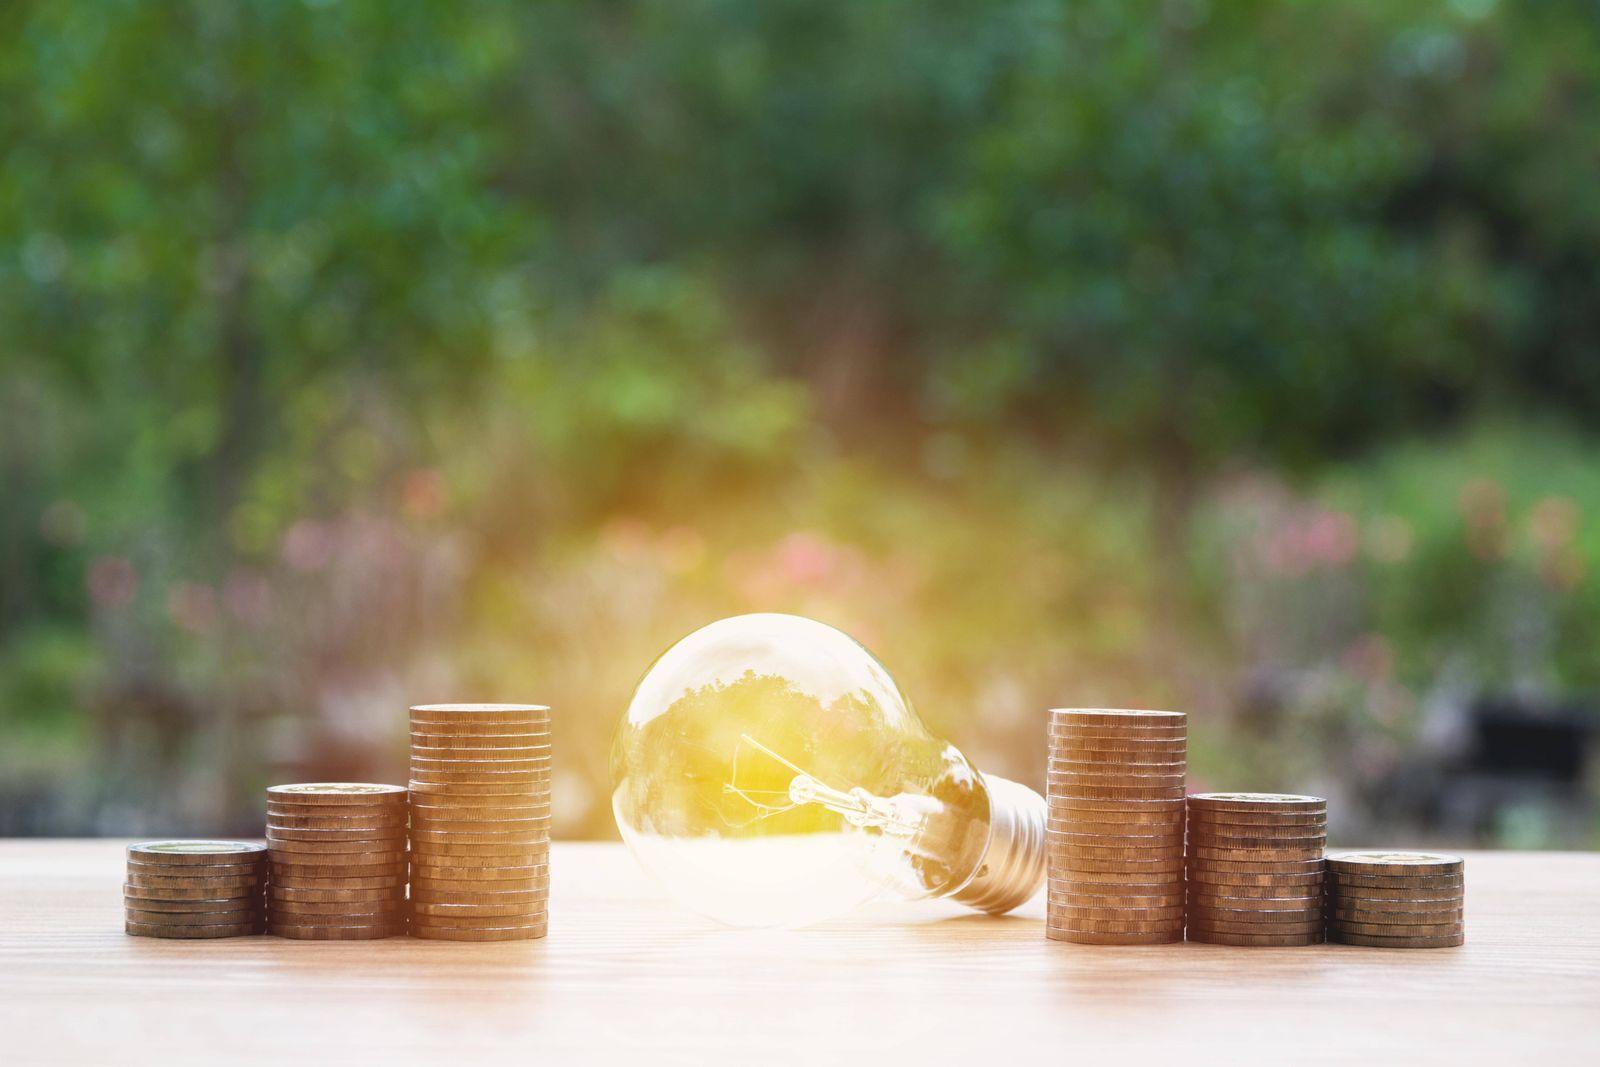 Energy saving light bulb with stacks of coins on nature background PUBLICATIONxINxGERxSUIxAUTxONLY